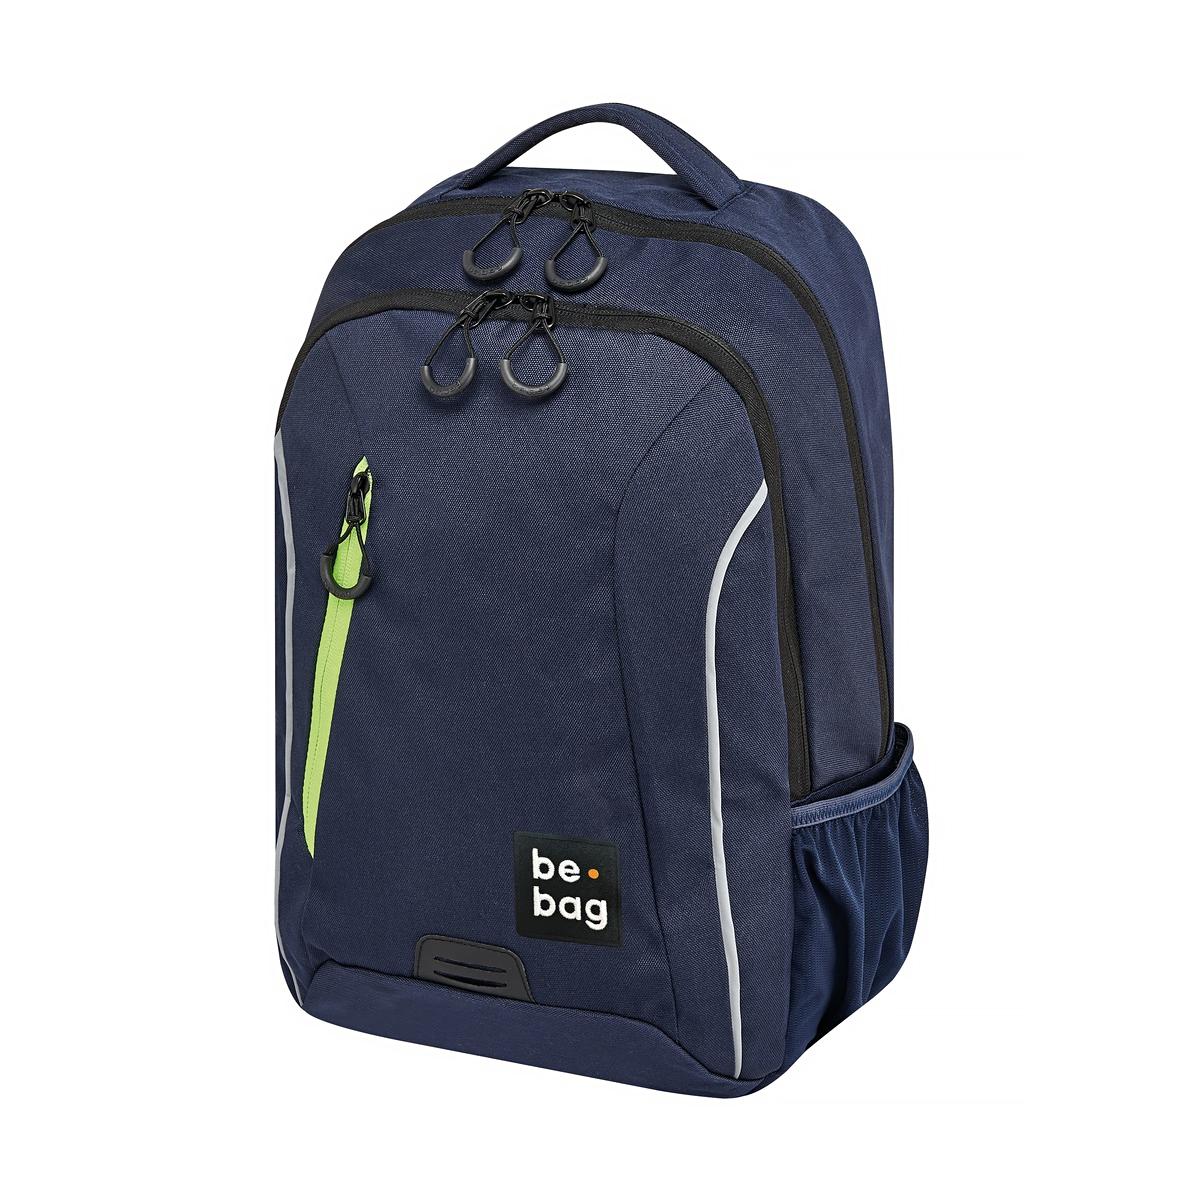 Rucsac Ergonomic Be.Bag, Be.Urban, Albastru Indigo & Verde, Herlitz, 24800105